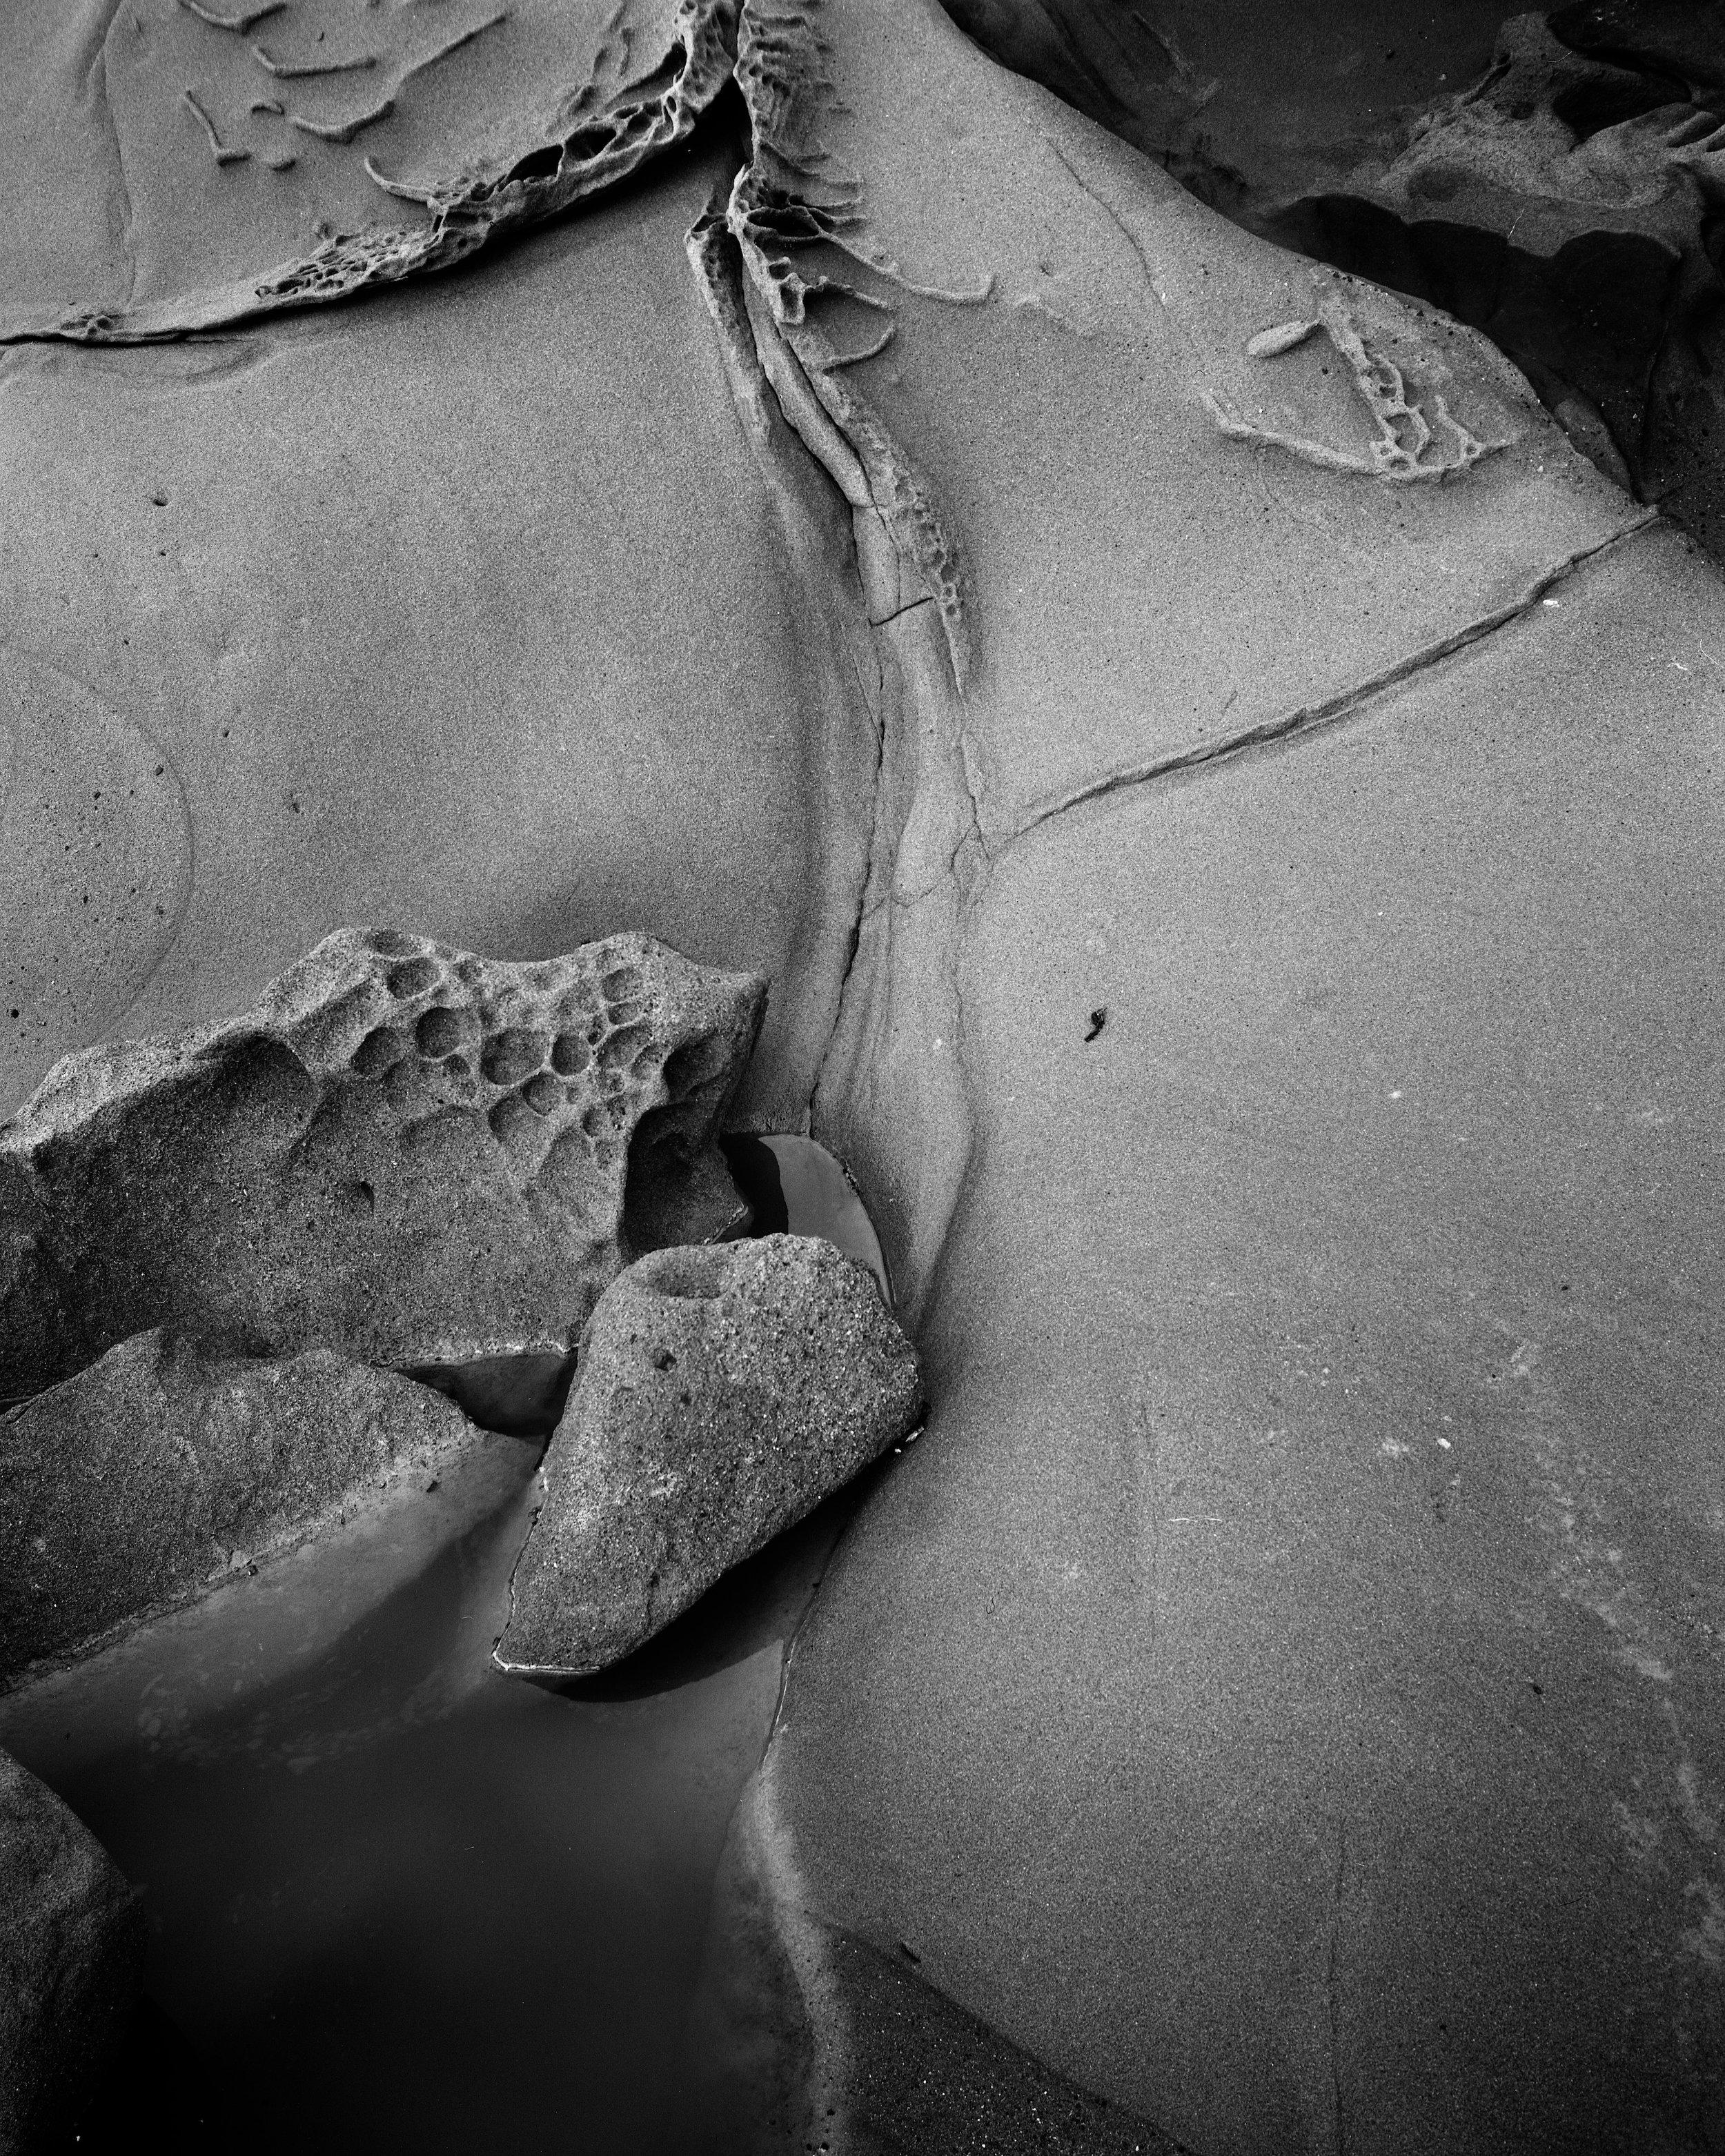 Bean Hollowed Sandstone Detail.Nagaoka 4x5, Fujinon 125mm f/5.6, Ilford Delta 100